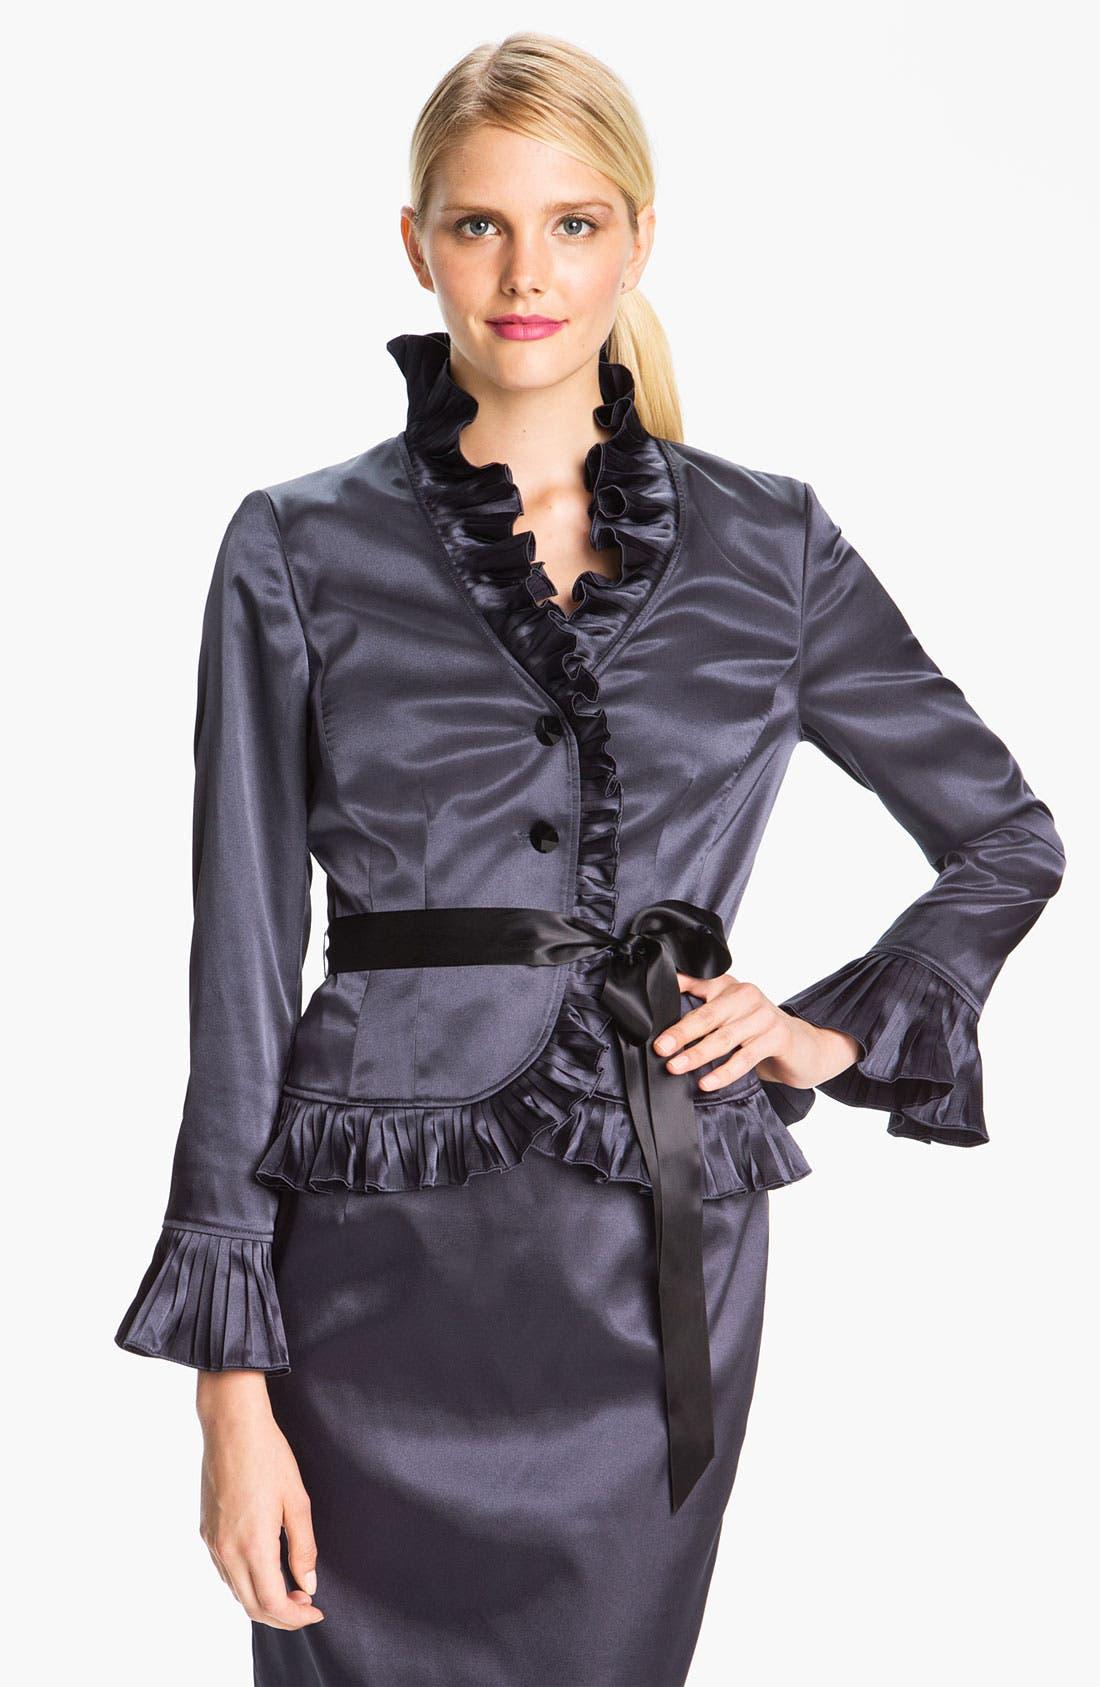 Alternate Image 1 Selected - Adrianna Papell Ruffle Trim Satin Jacket